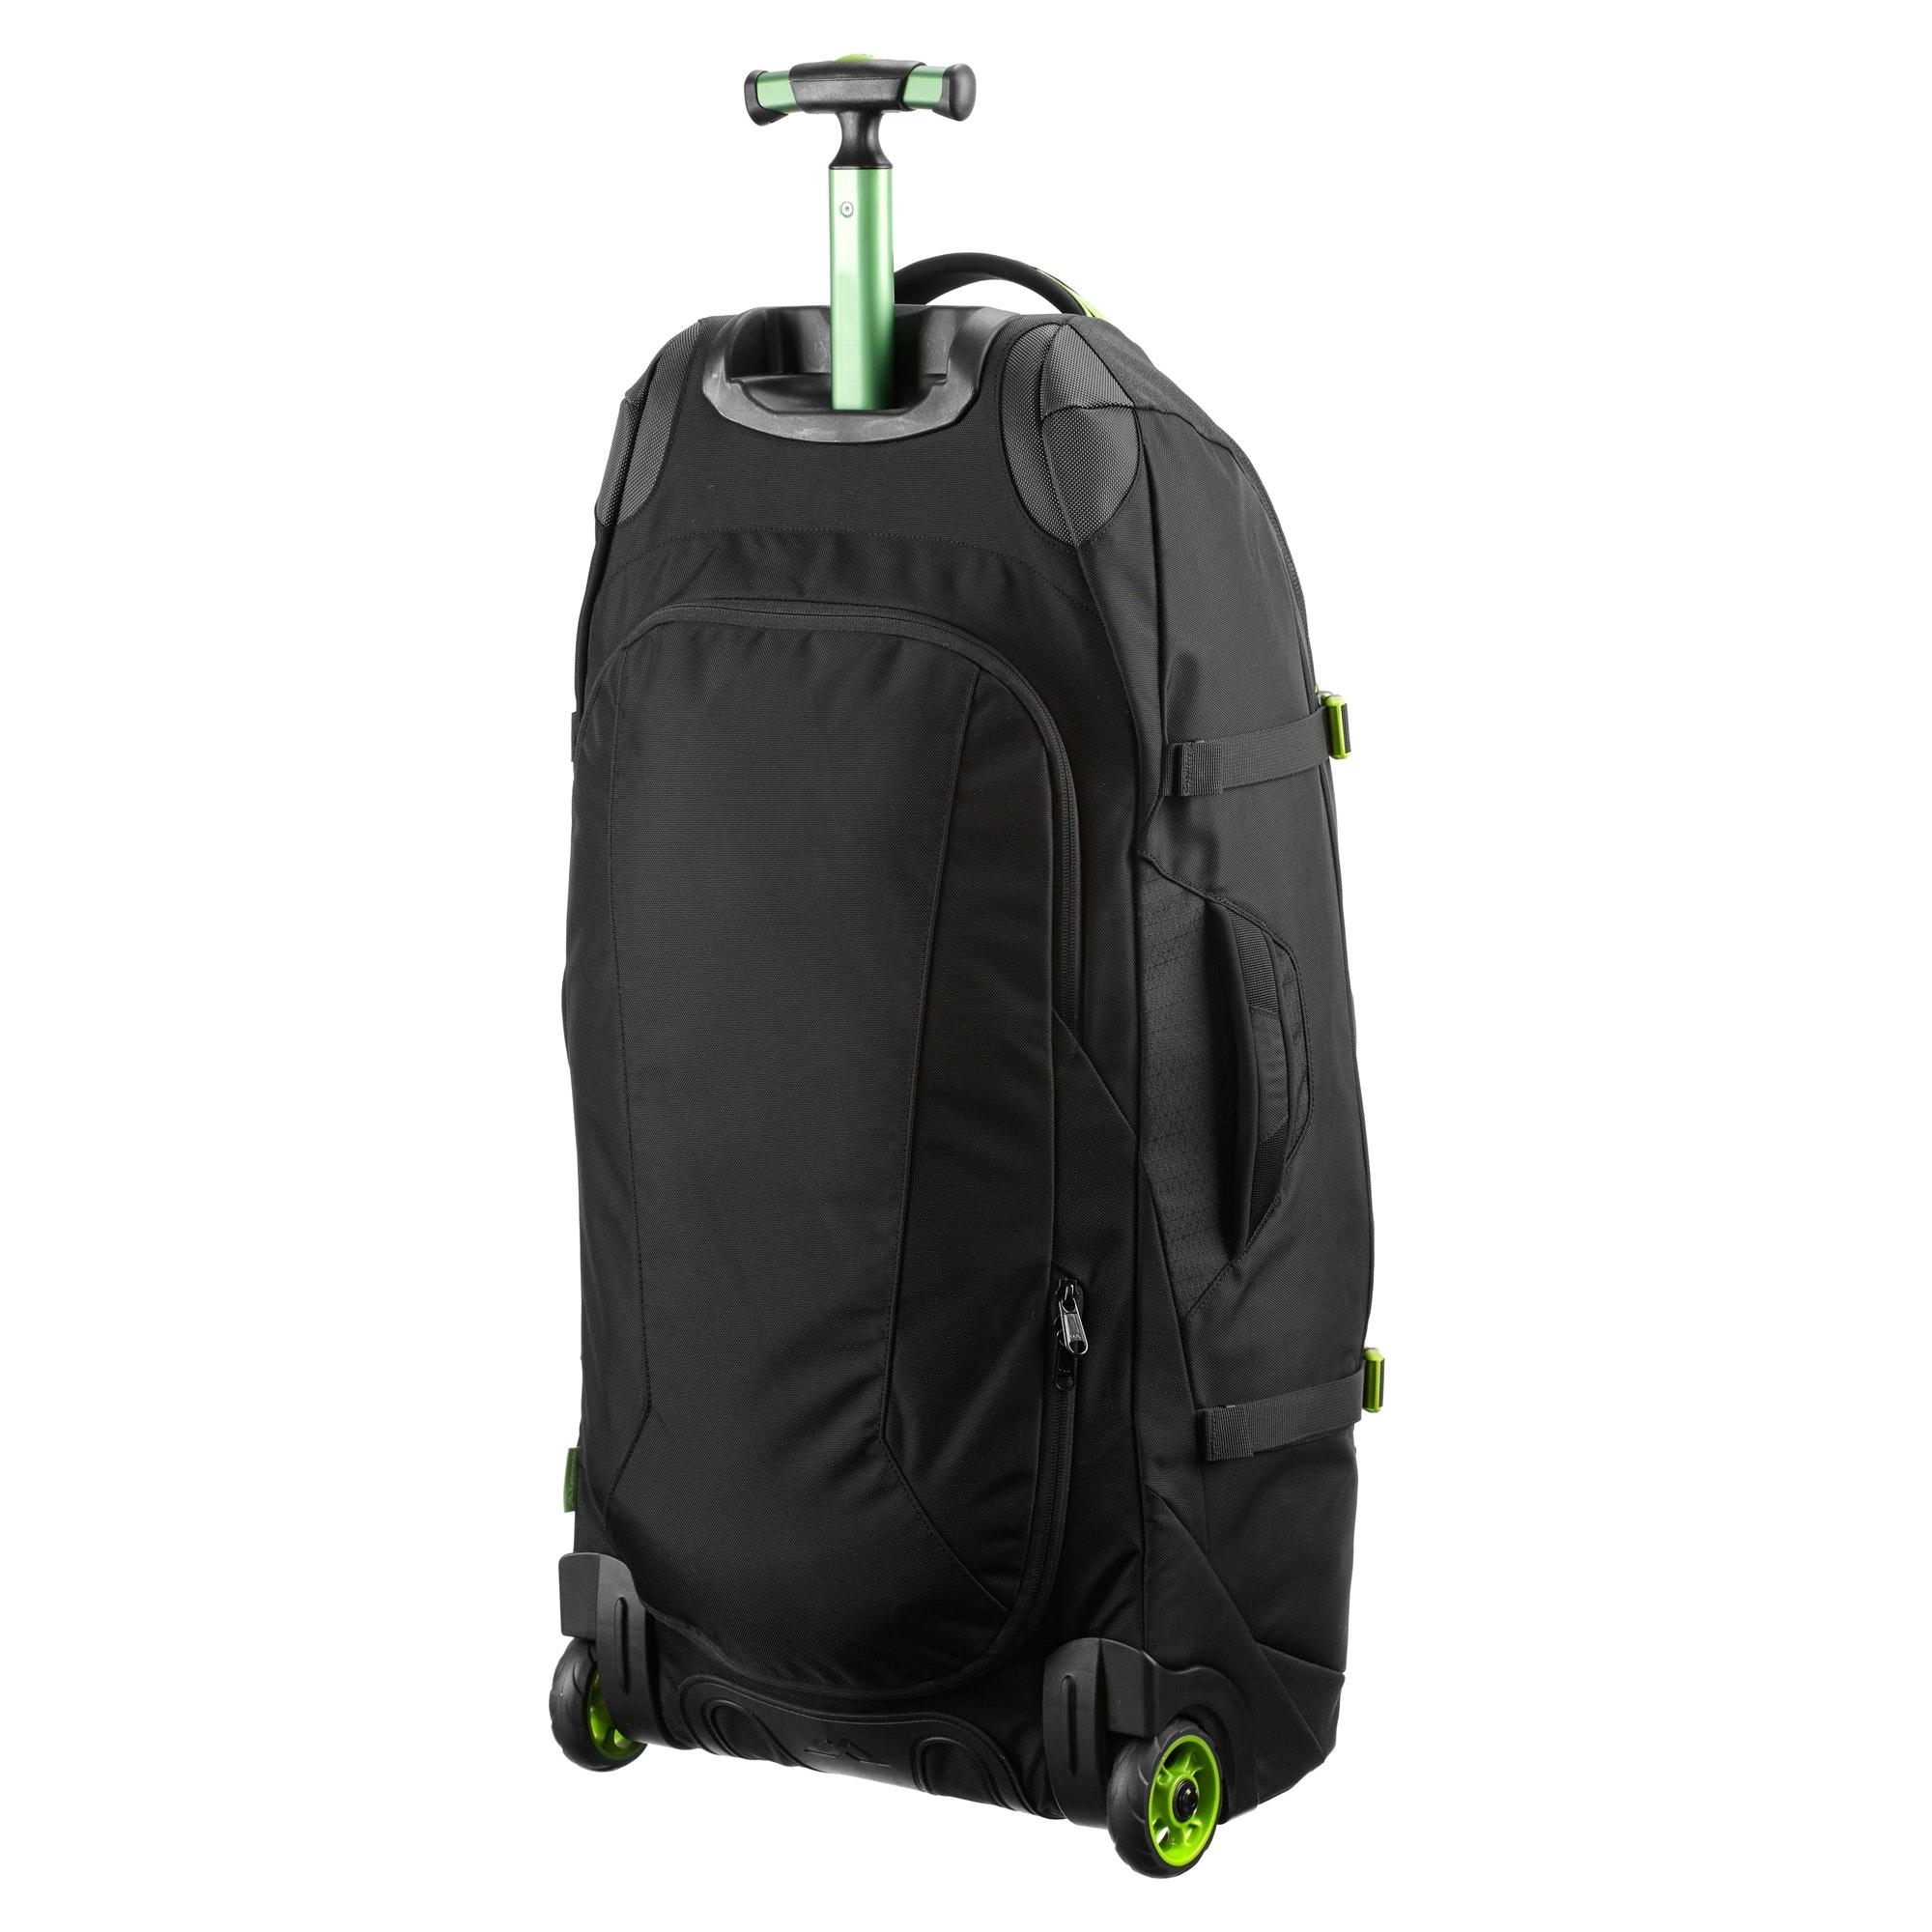 thumbnail 10 - NEW-Kathmandu-Hybrid-70L-Backpack-Wheeled-Handle-Luggage-Bag-Travel-Trolley